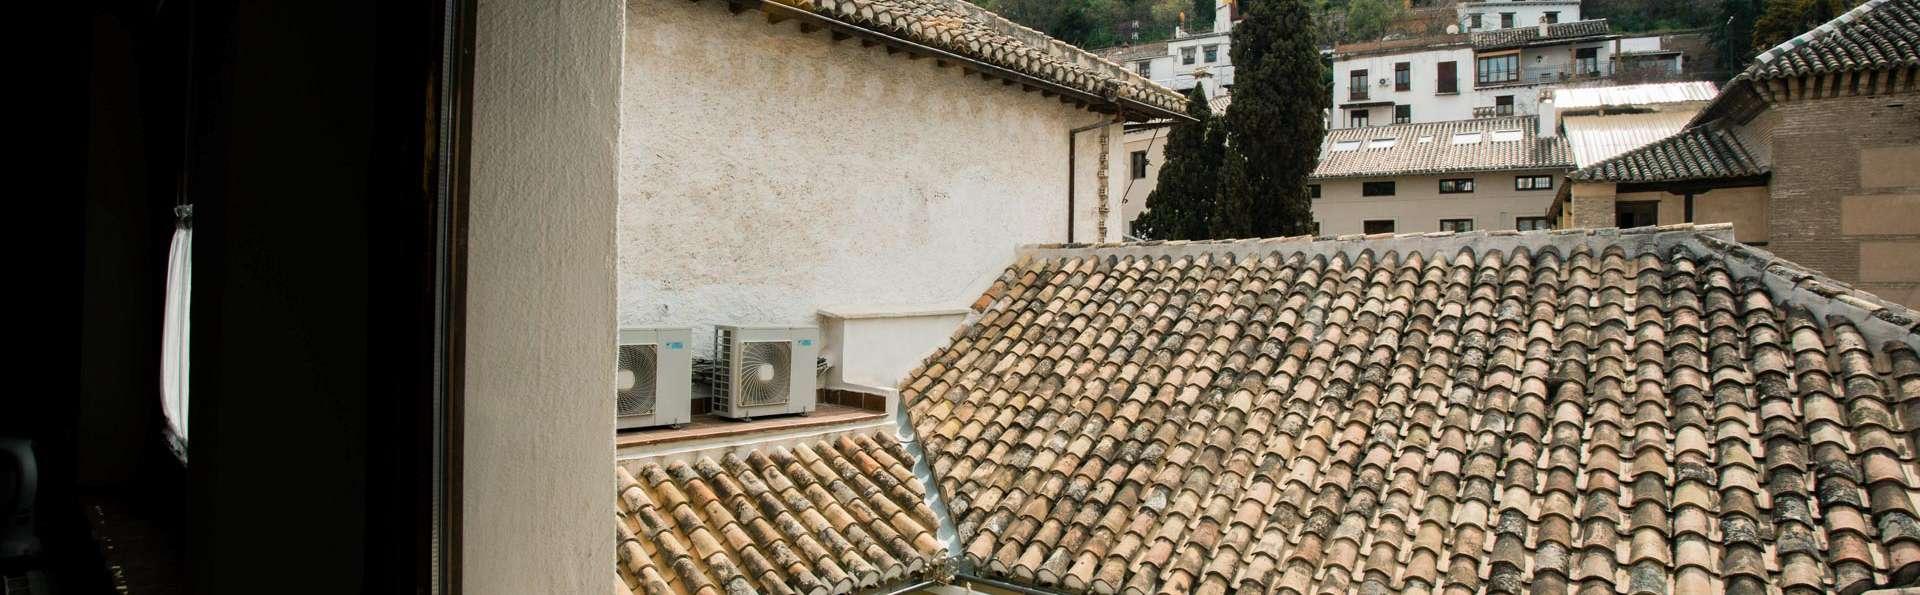 Hotel Casa del Capitel Nazarí - EDIT_VIEW_01.jpg